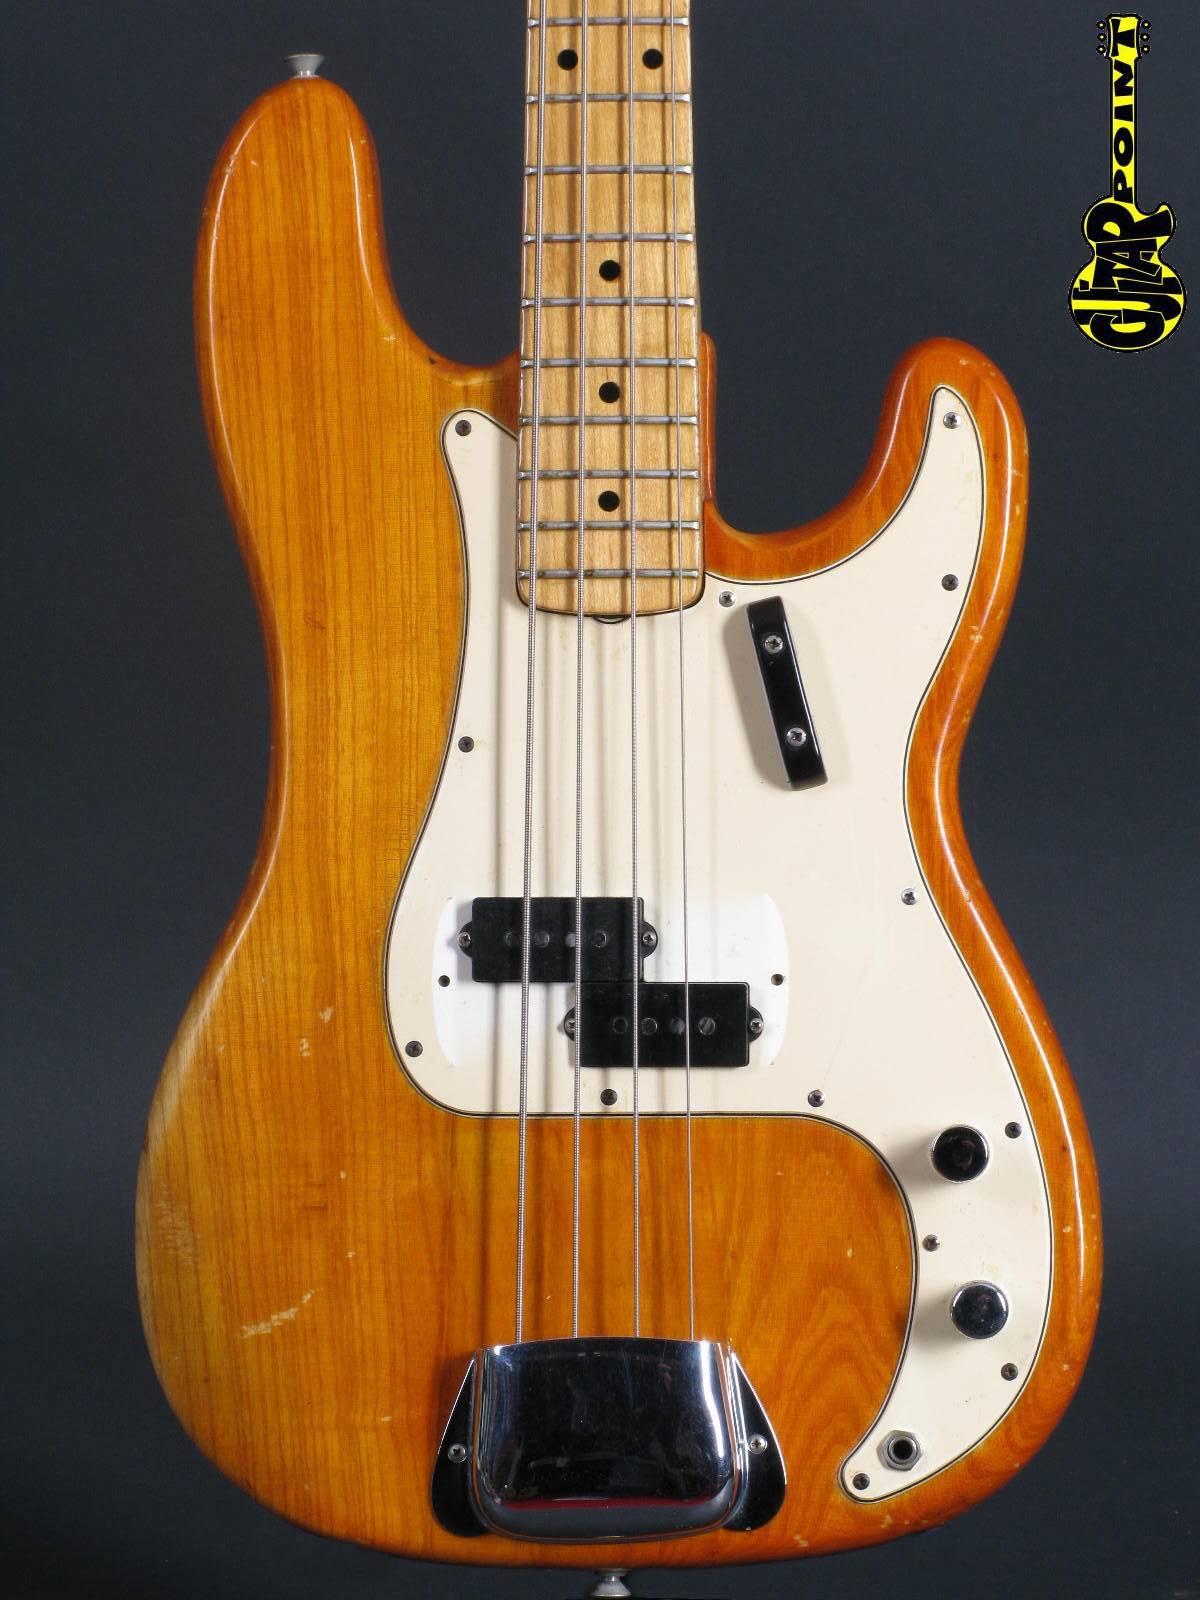 1973 Fender Precision Bass - Natural